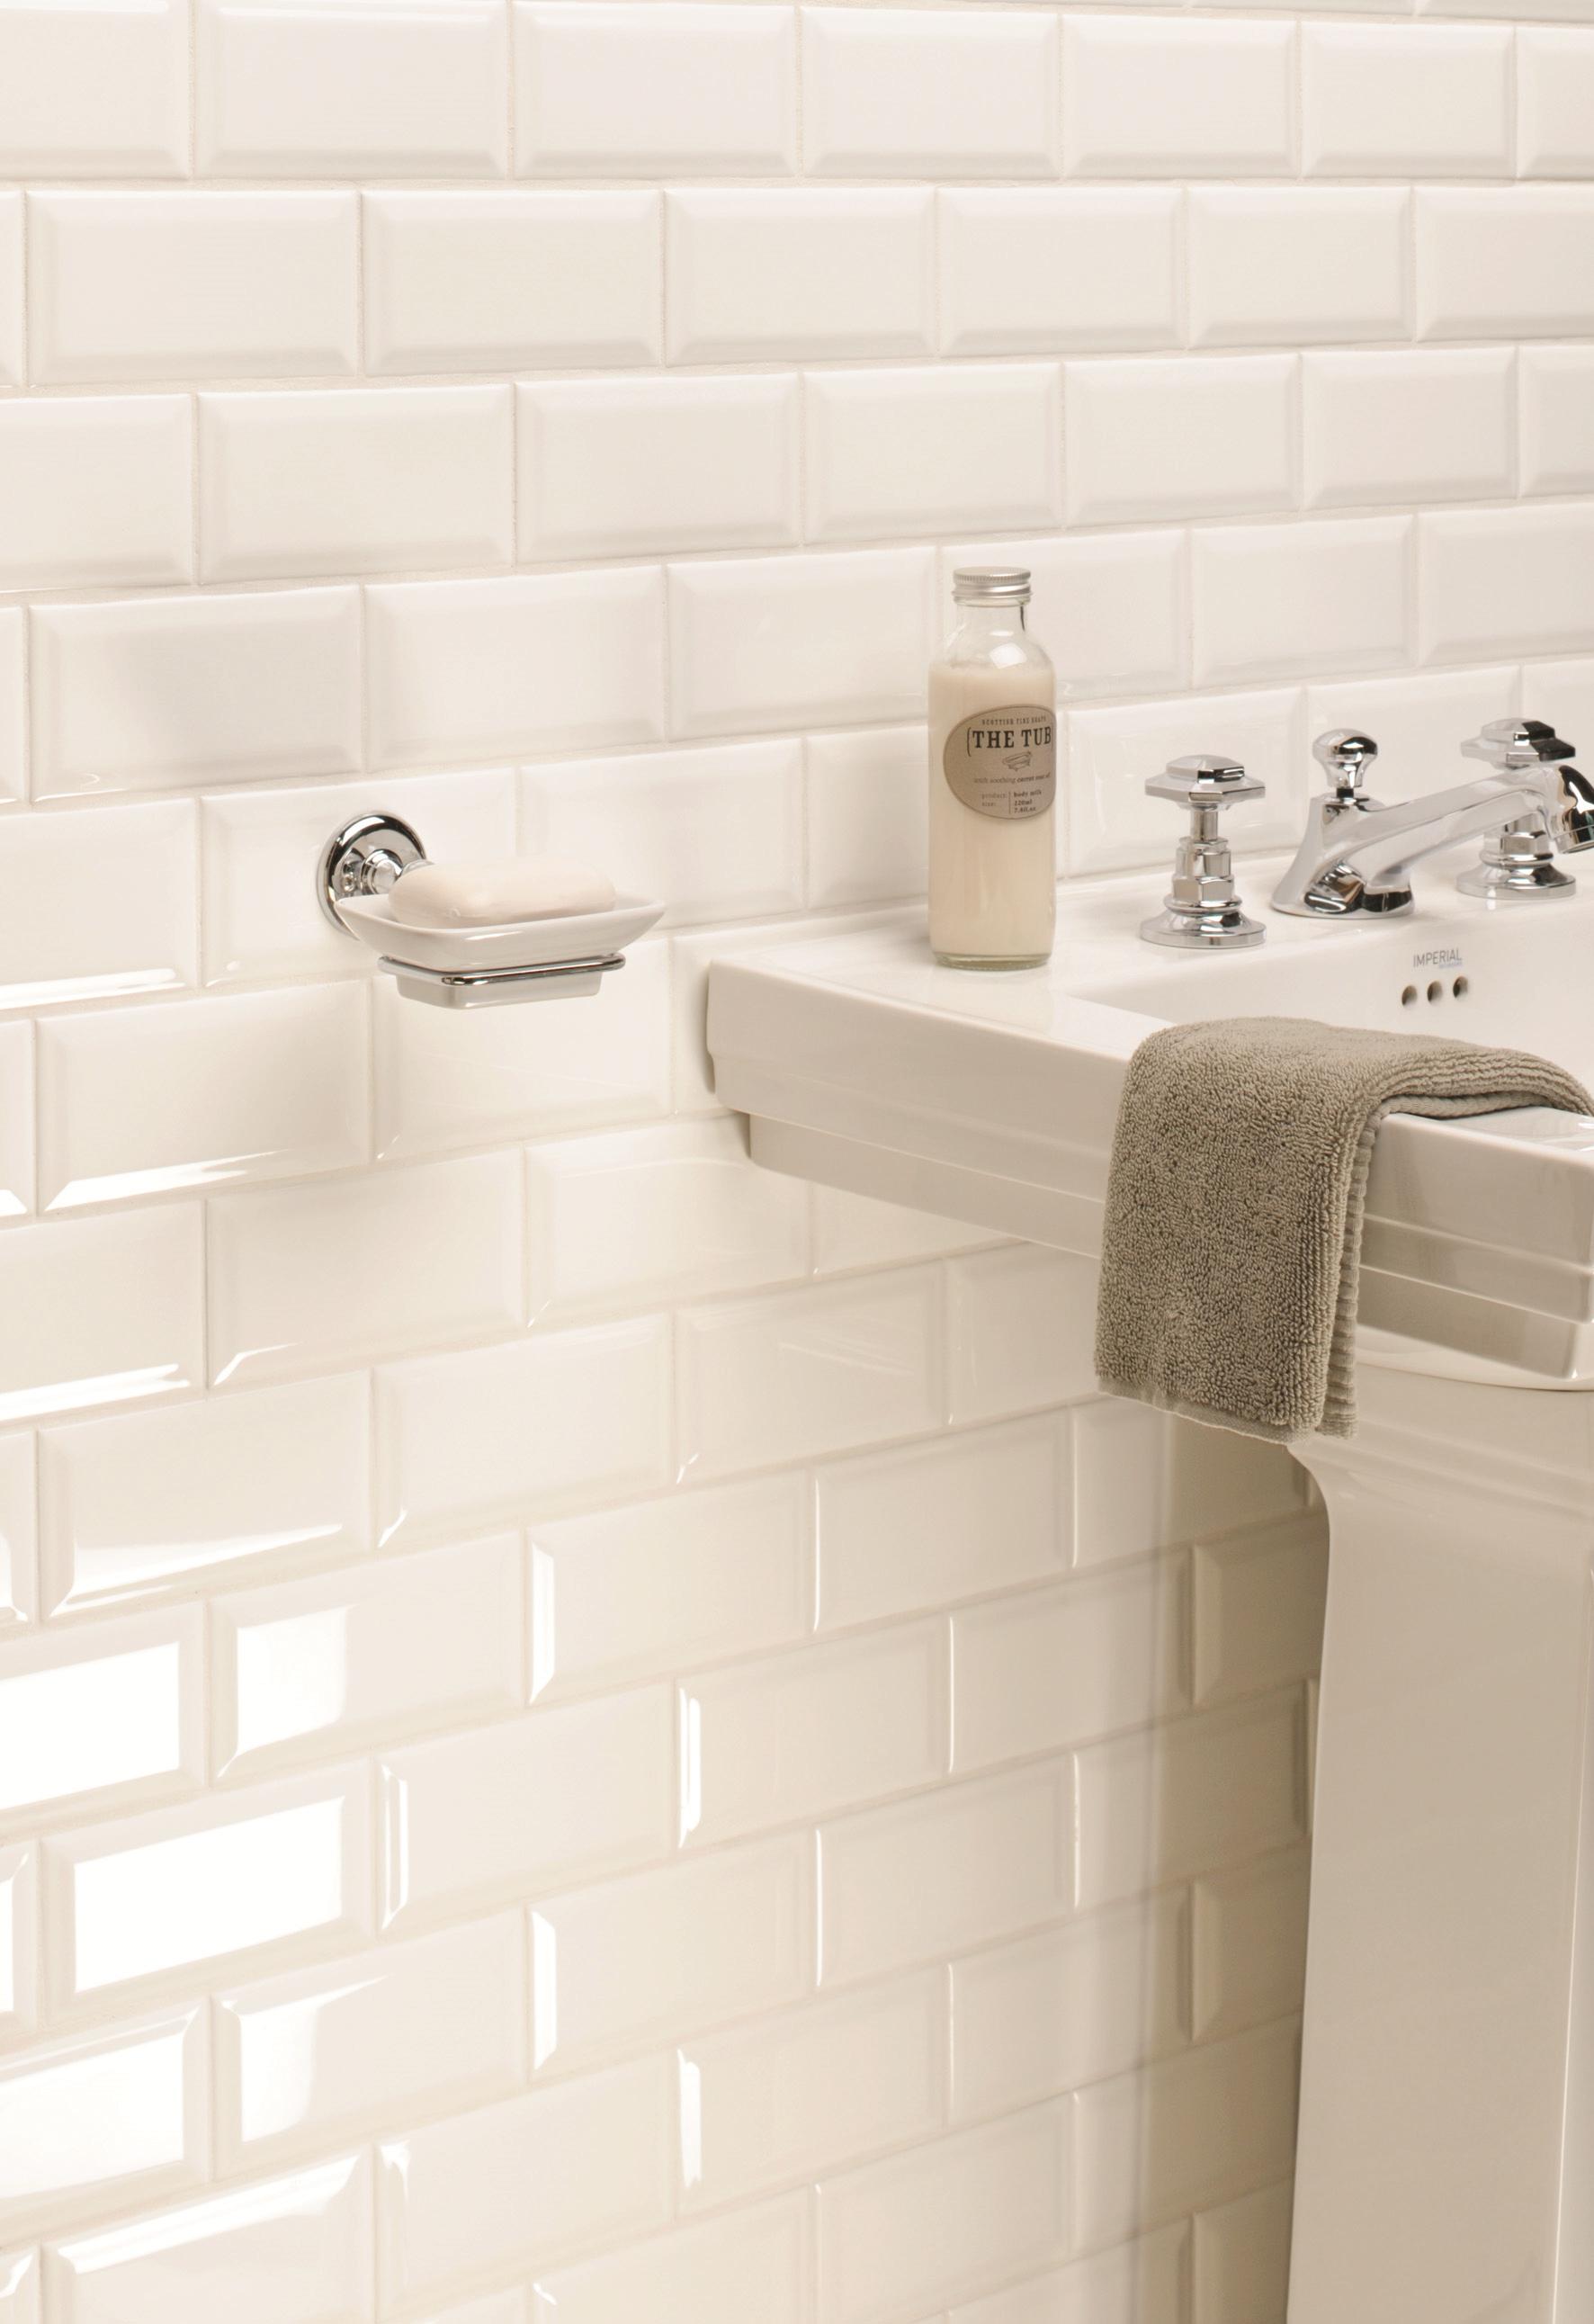 Image 2 Kitchen Tiles Design Kitchen Tiles Bathroom